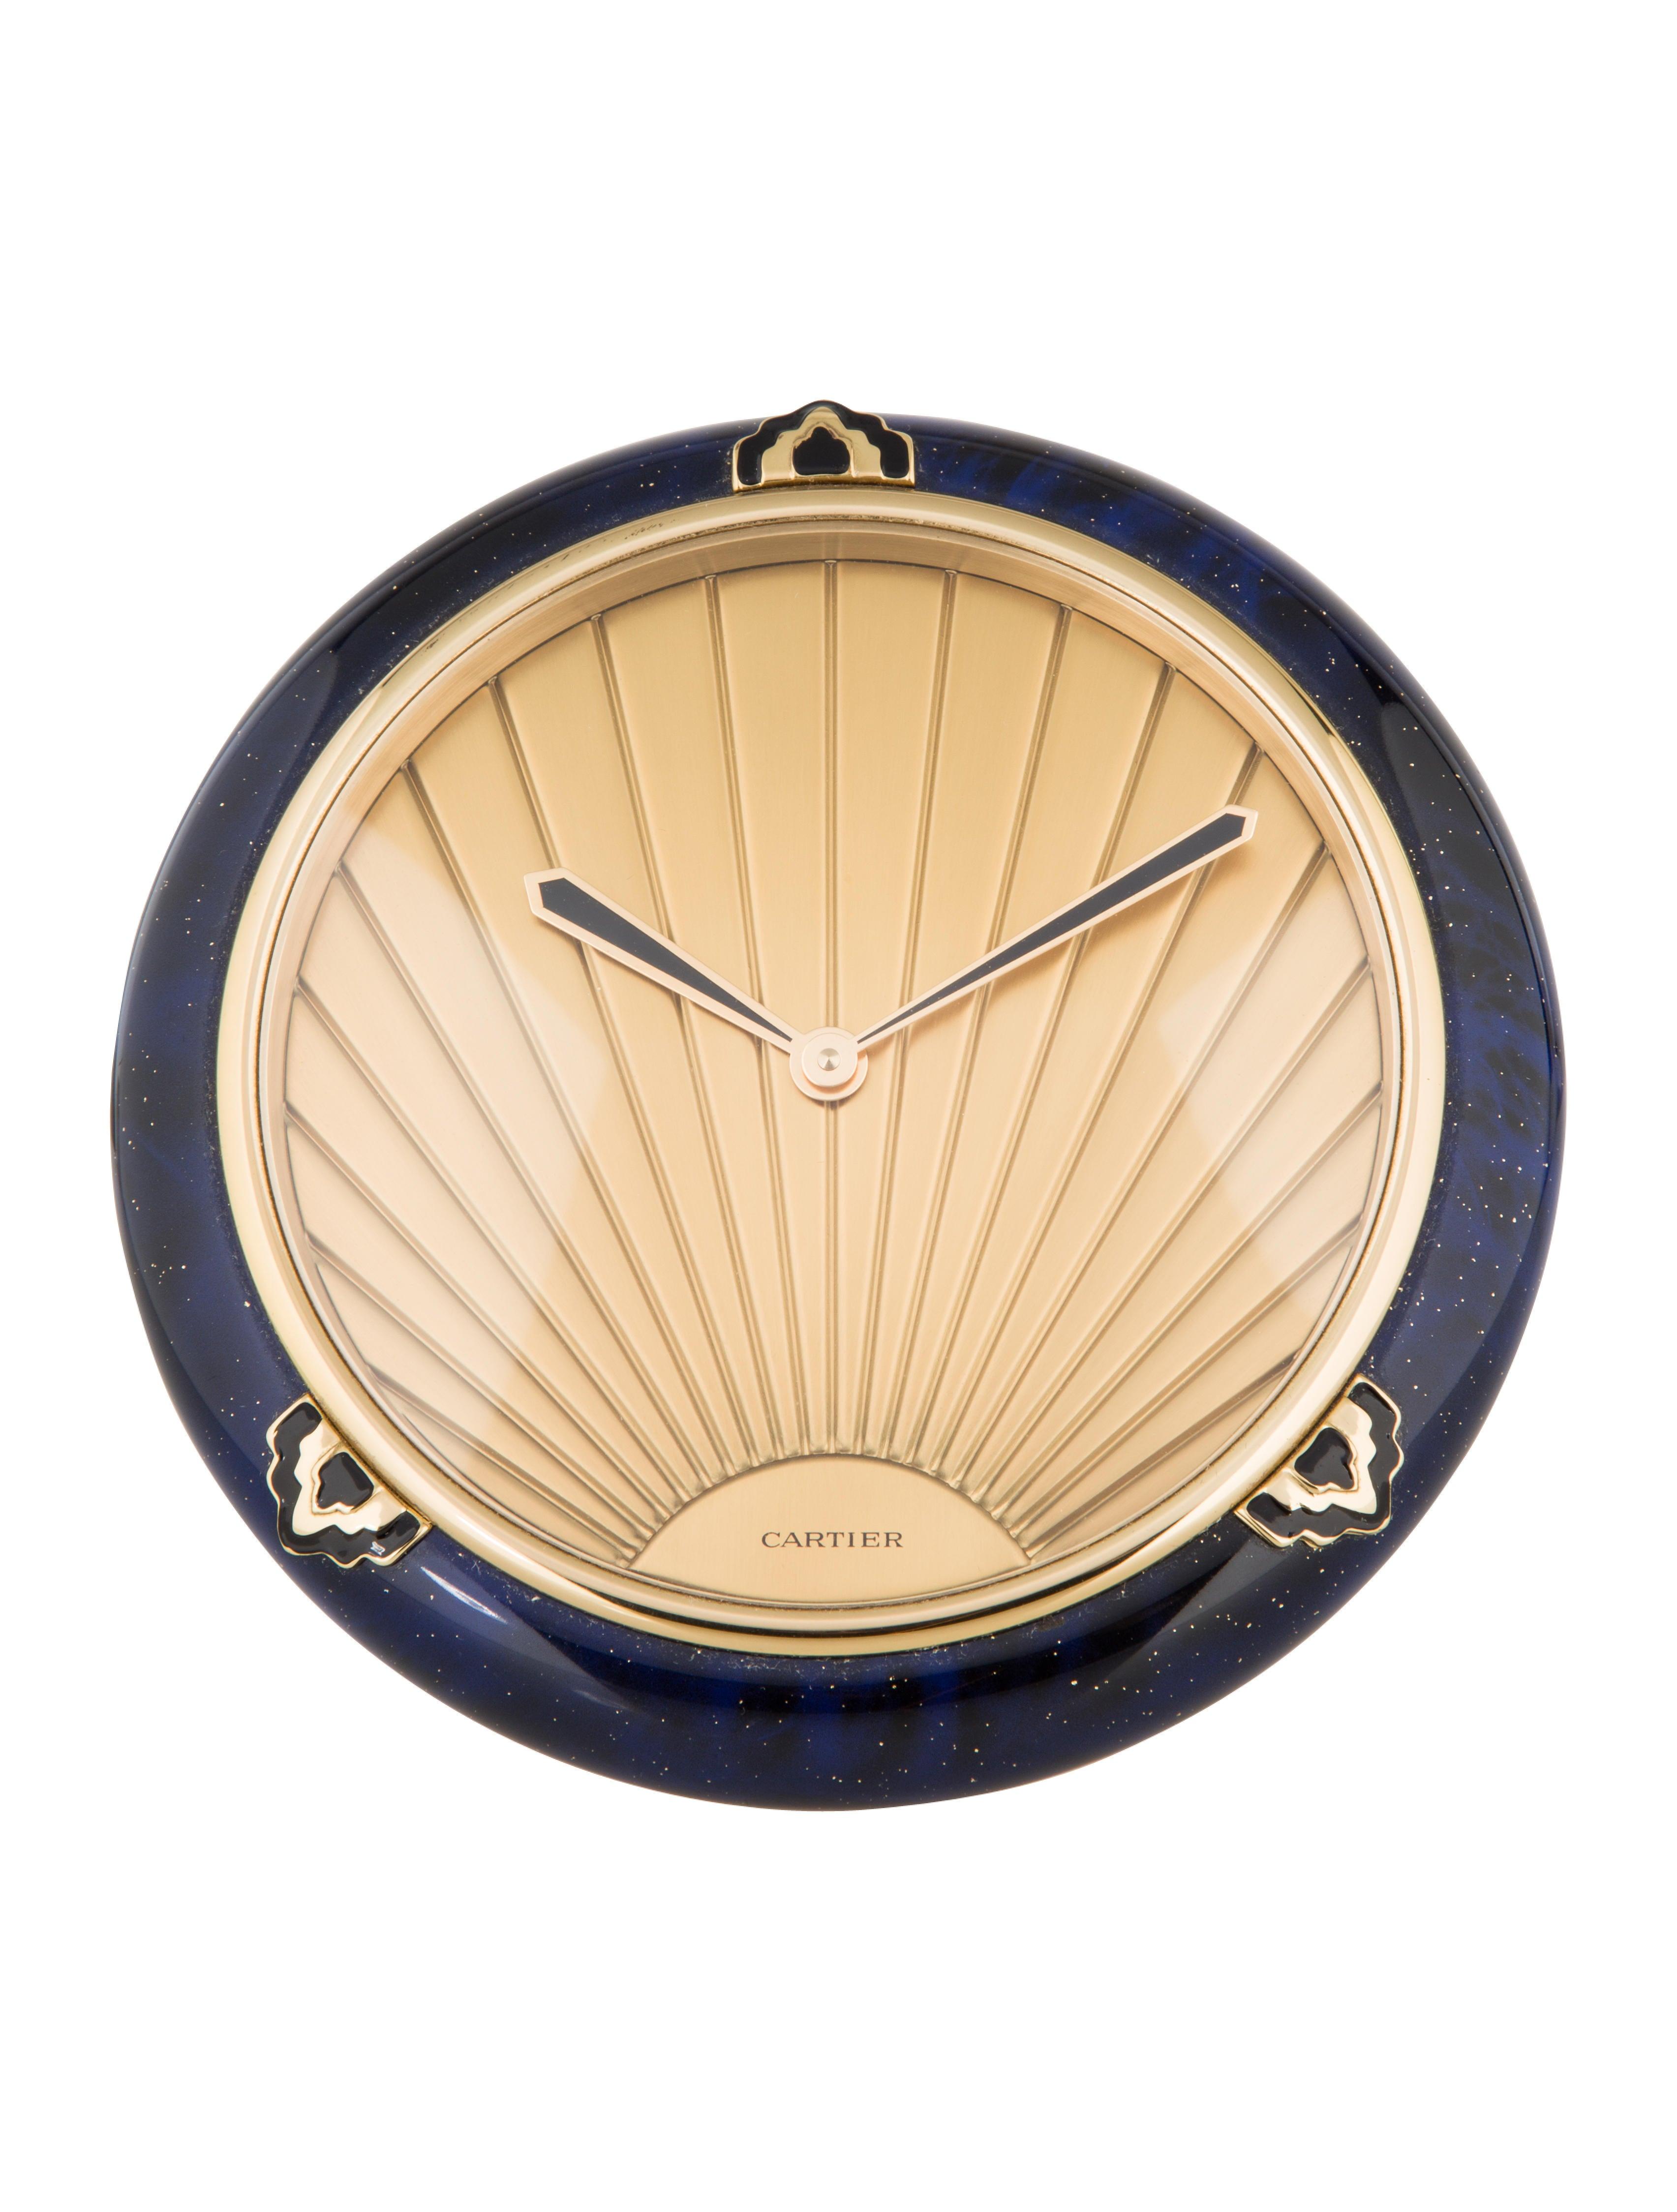 Cartier Art Deco Desk Clock Decor Amp Accessories